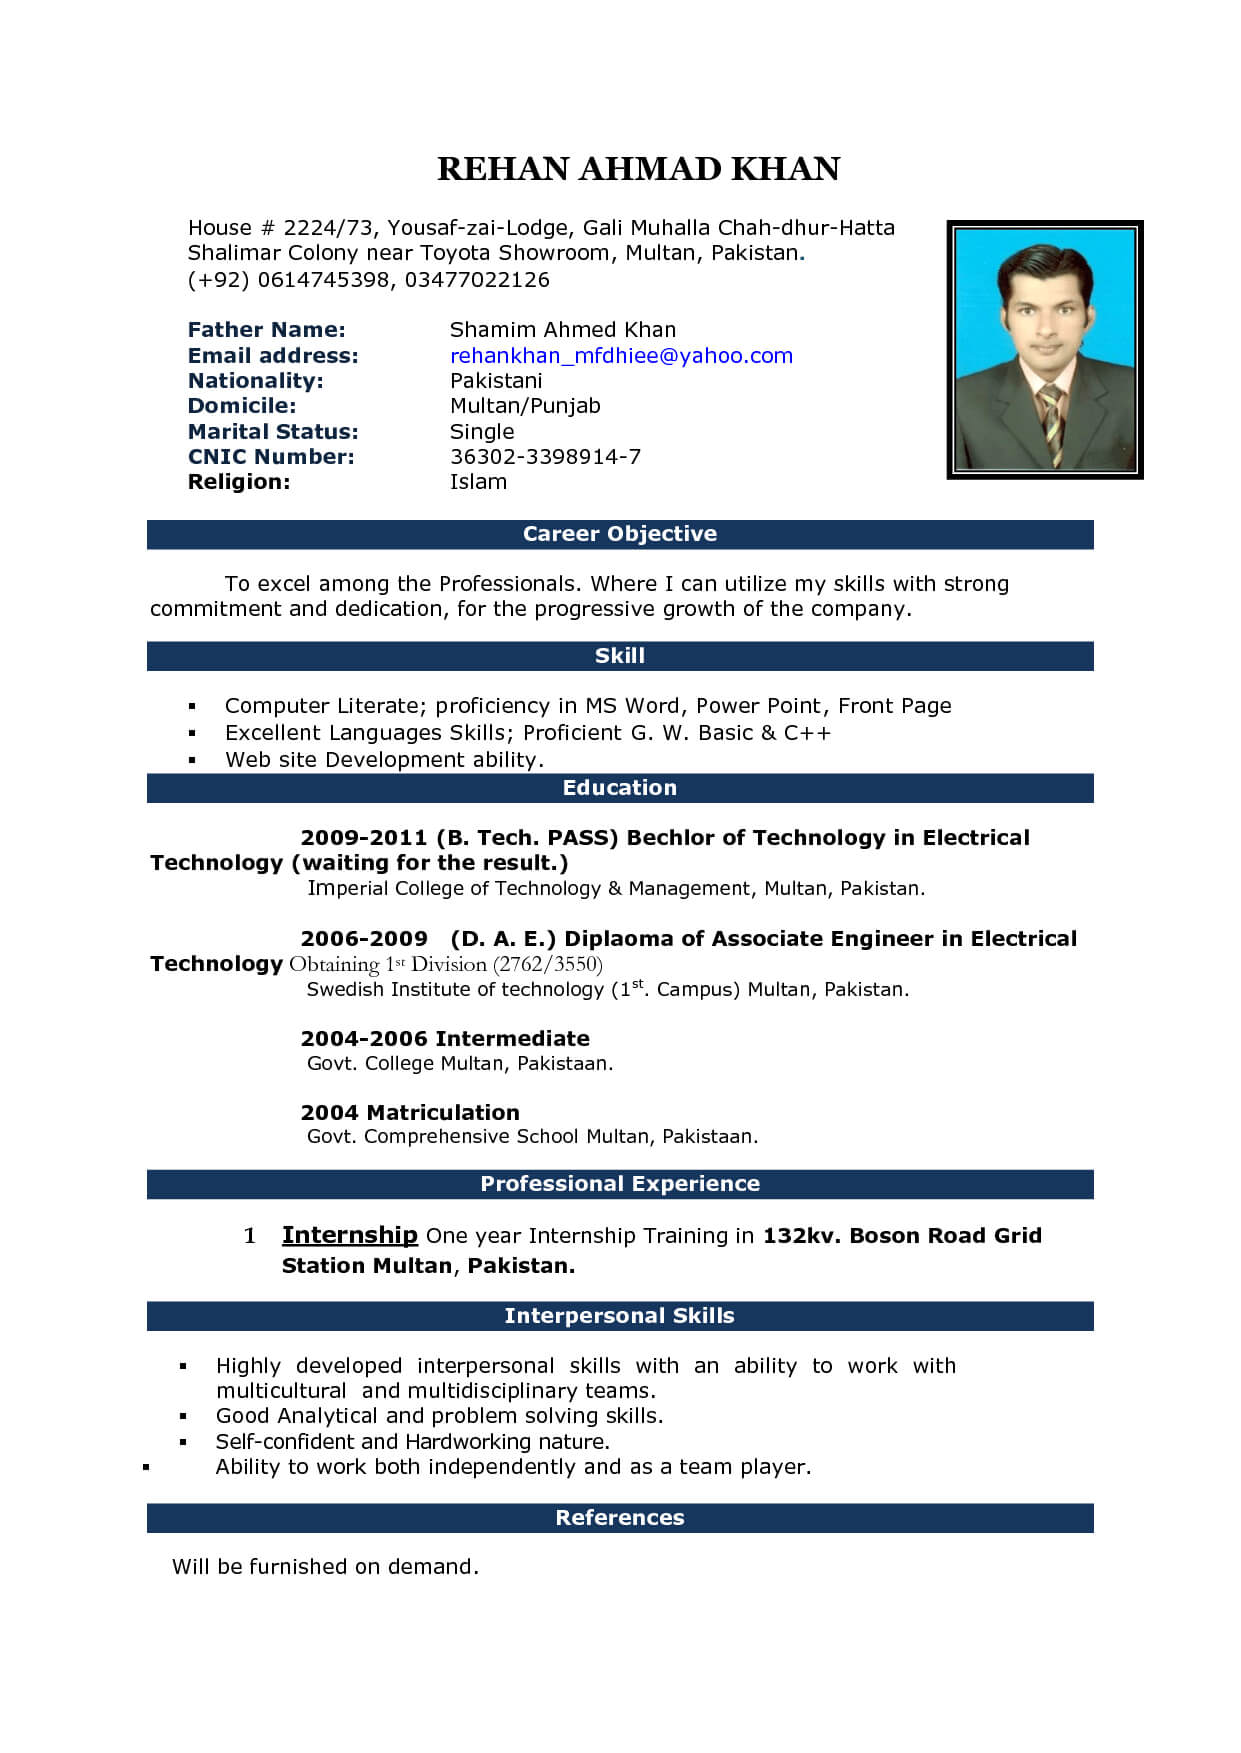 Cv Word Document Template Inside Simple Resume Template Microsoft Word